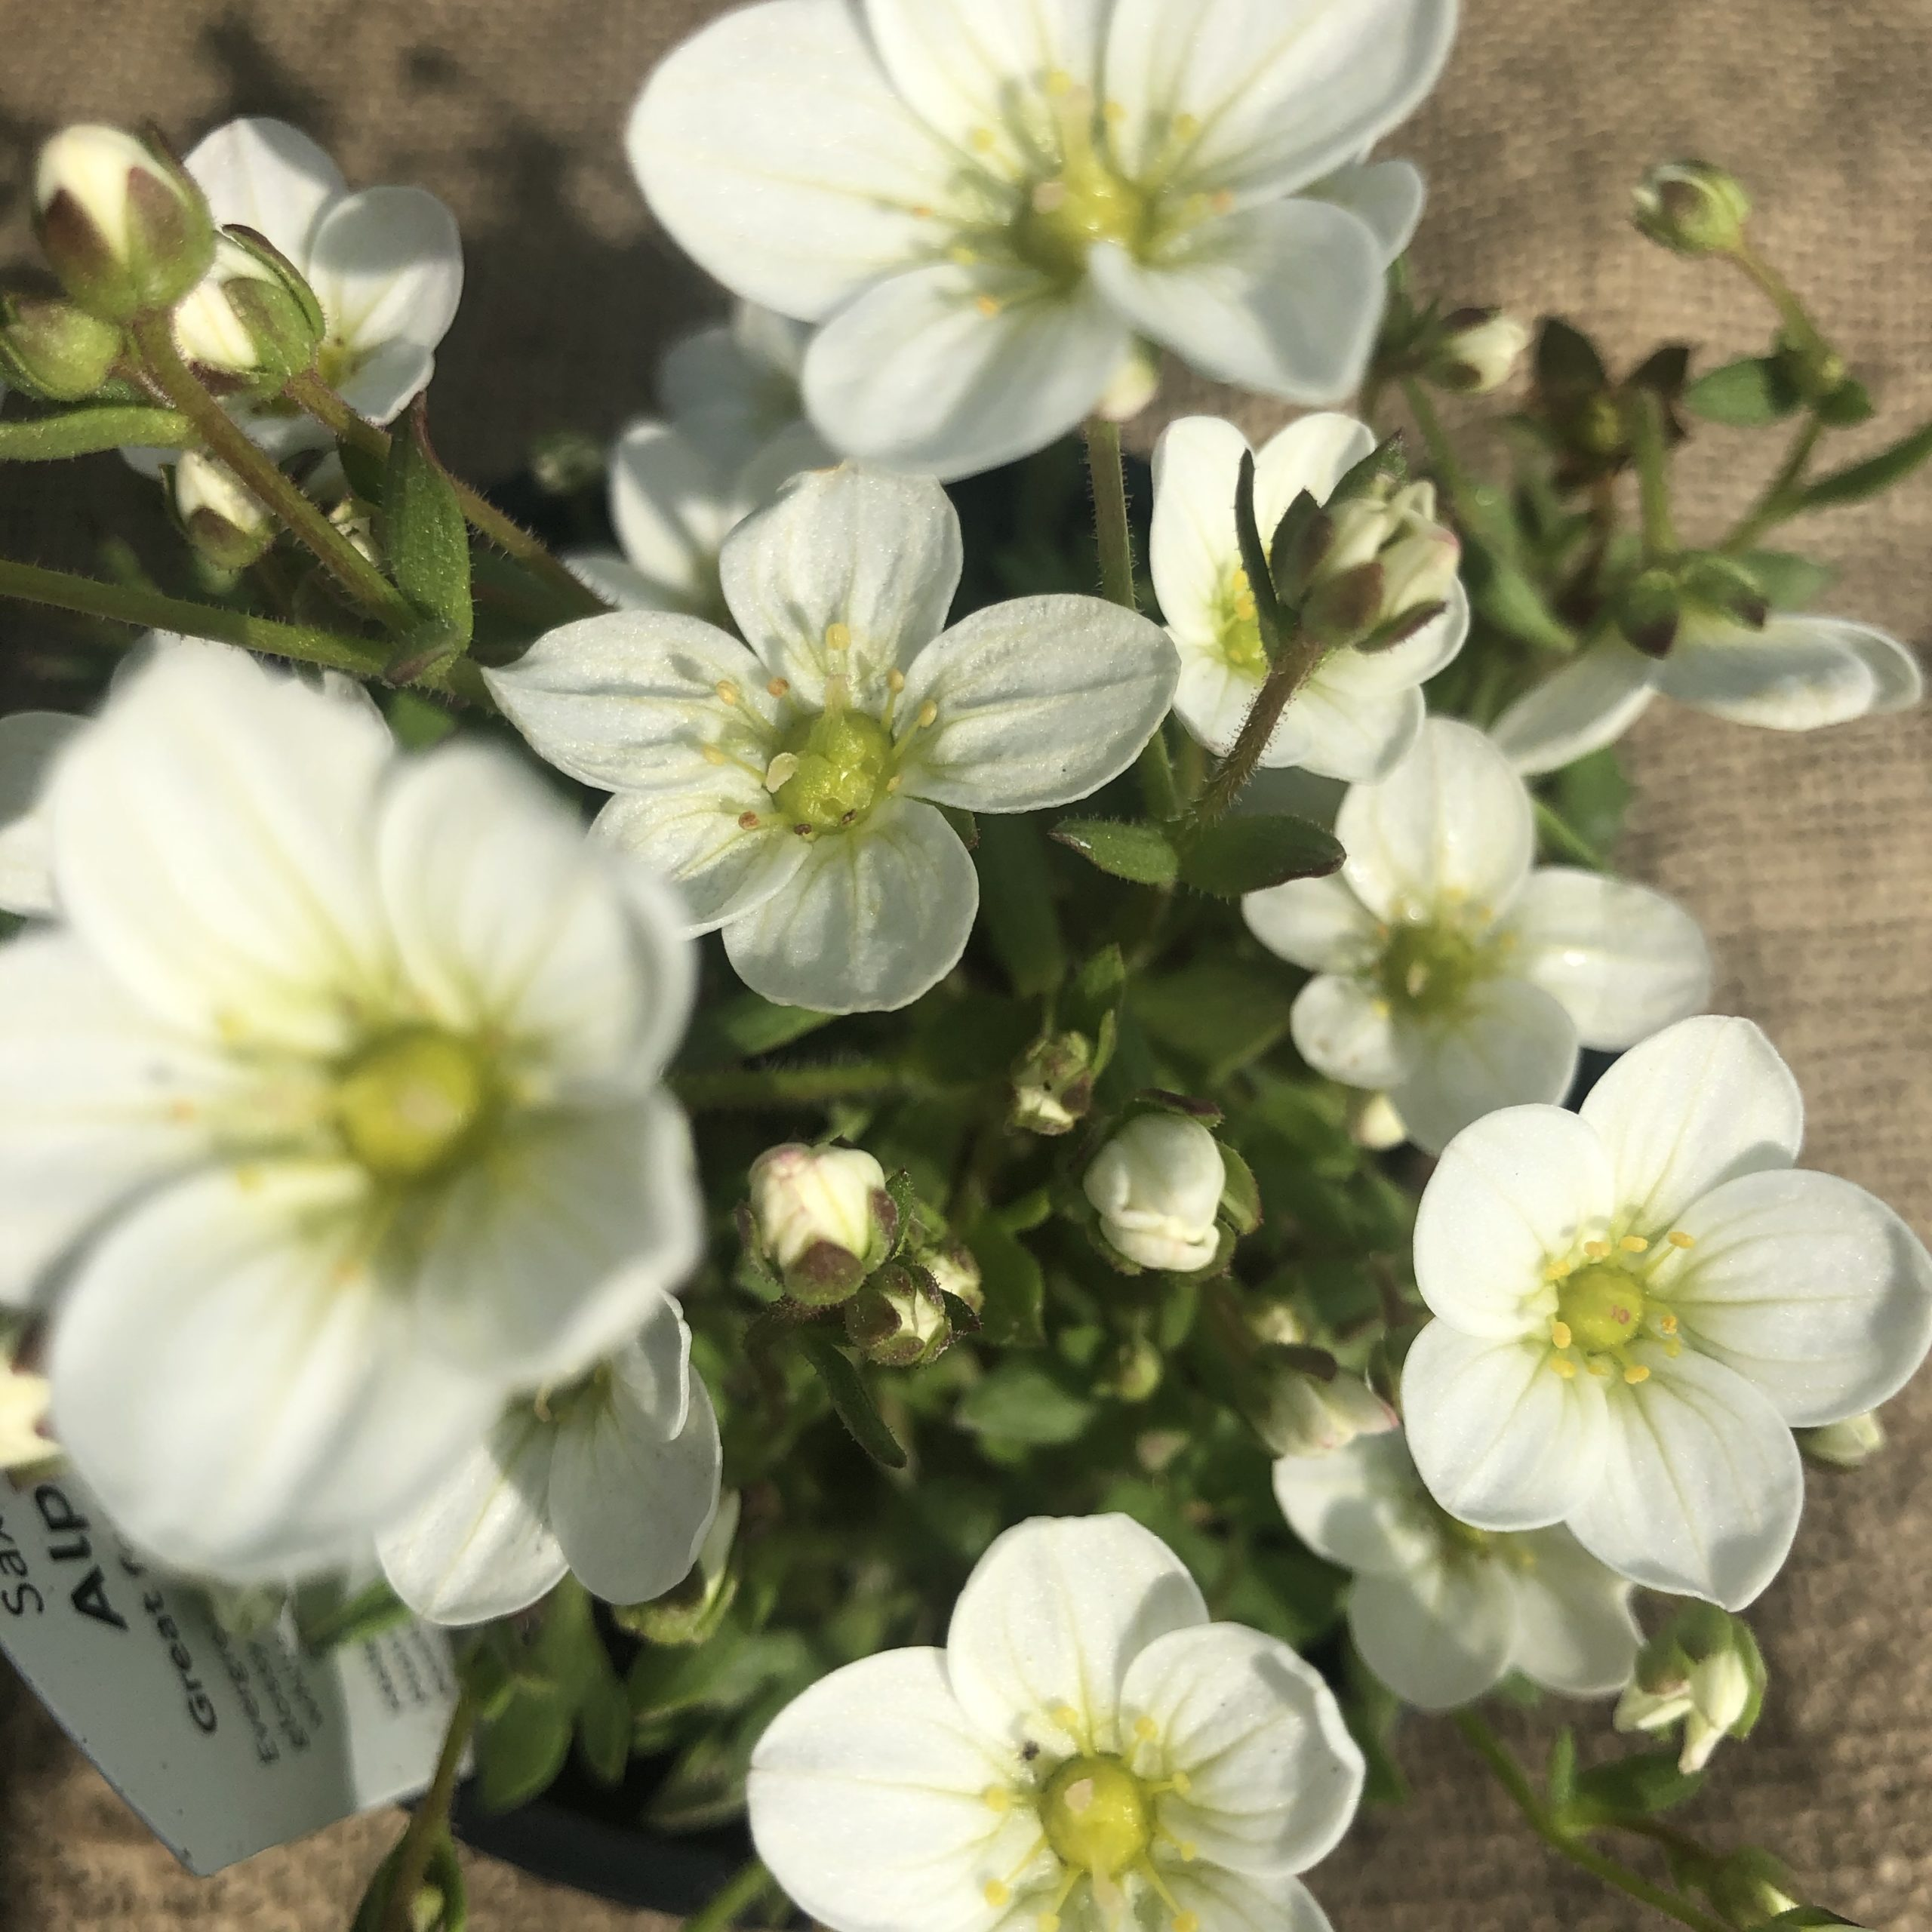 Shrubs and Perennials